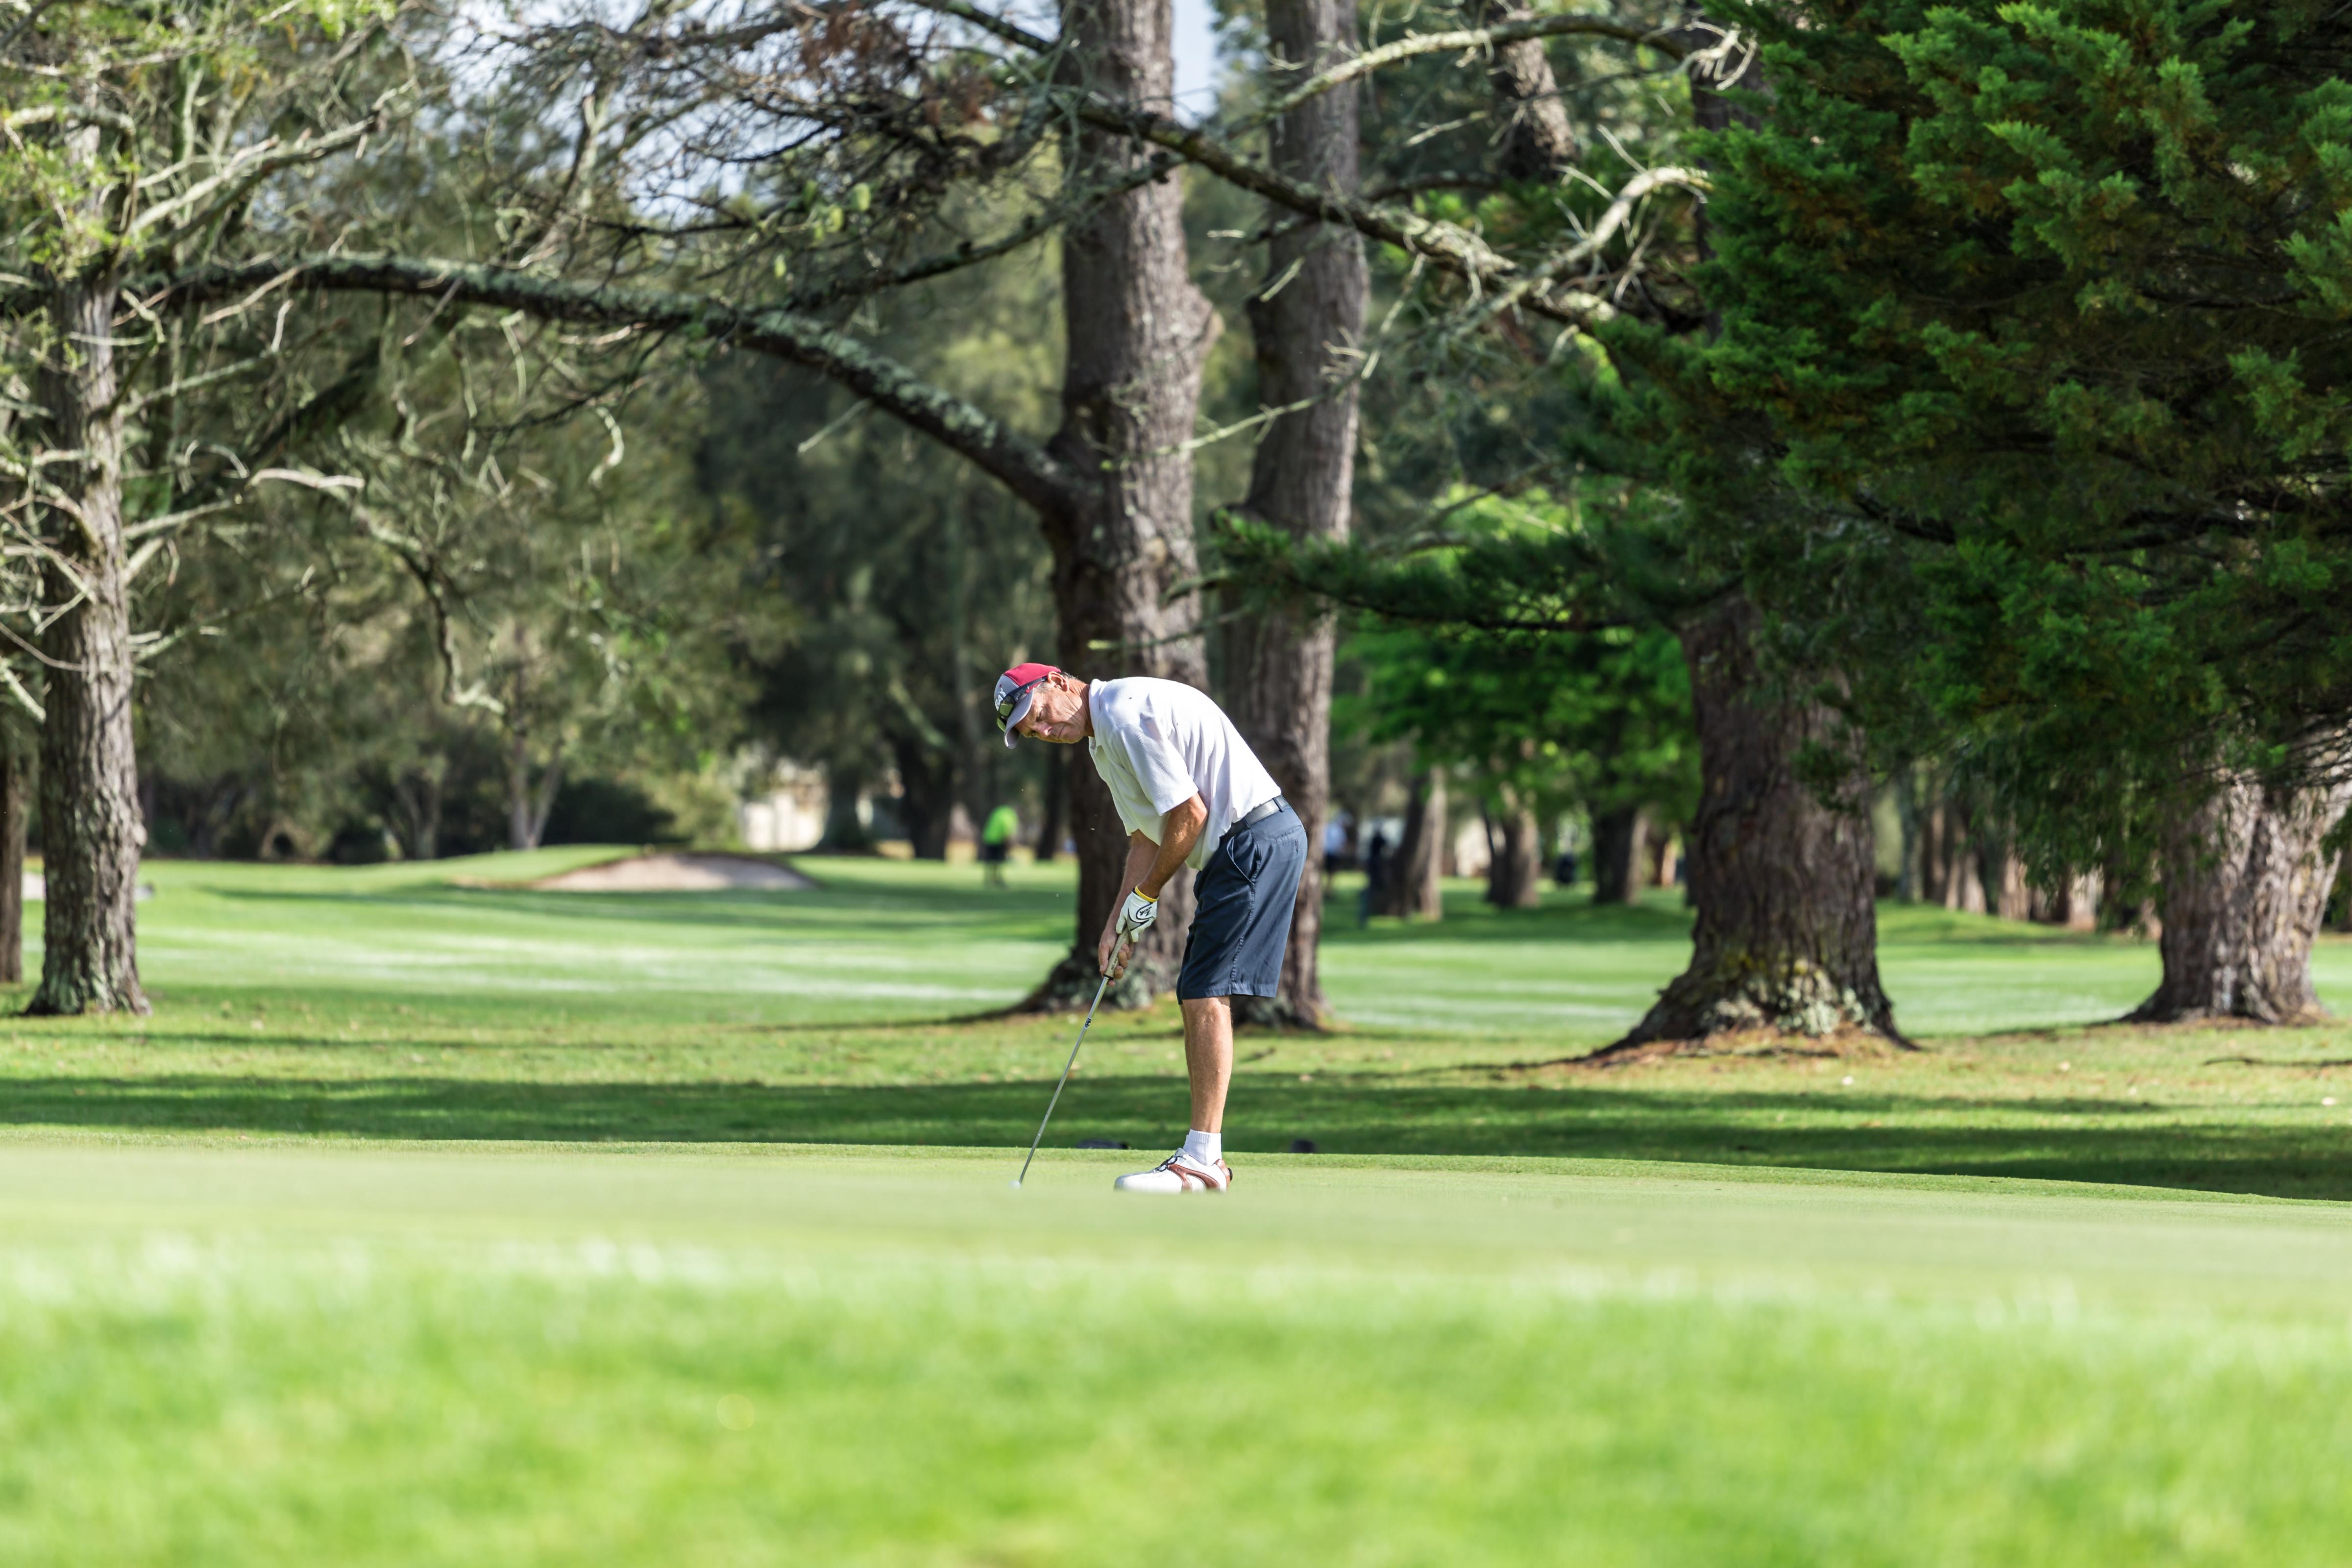 Catalina country club PGA hd (48 of 166)